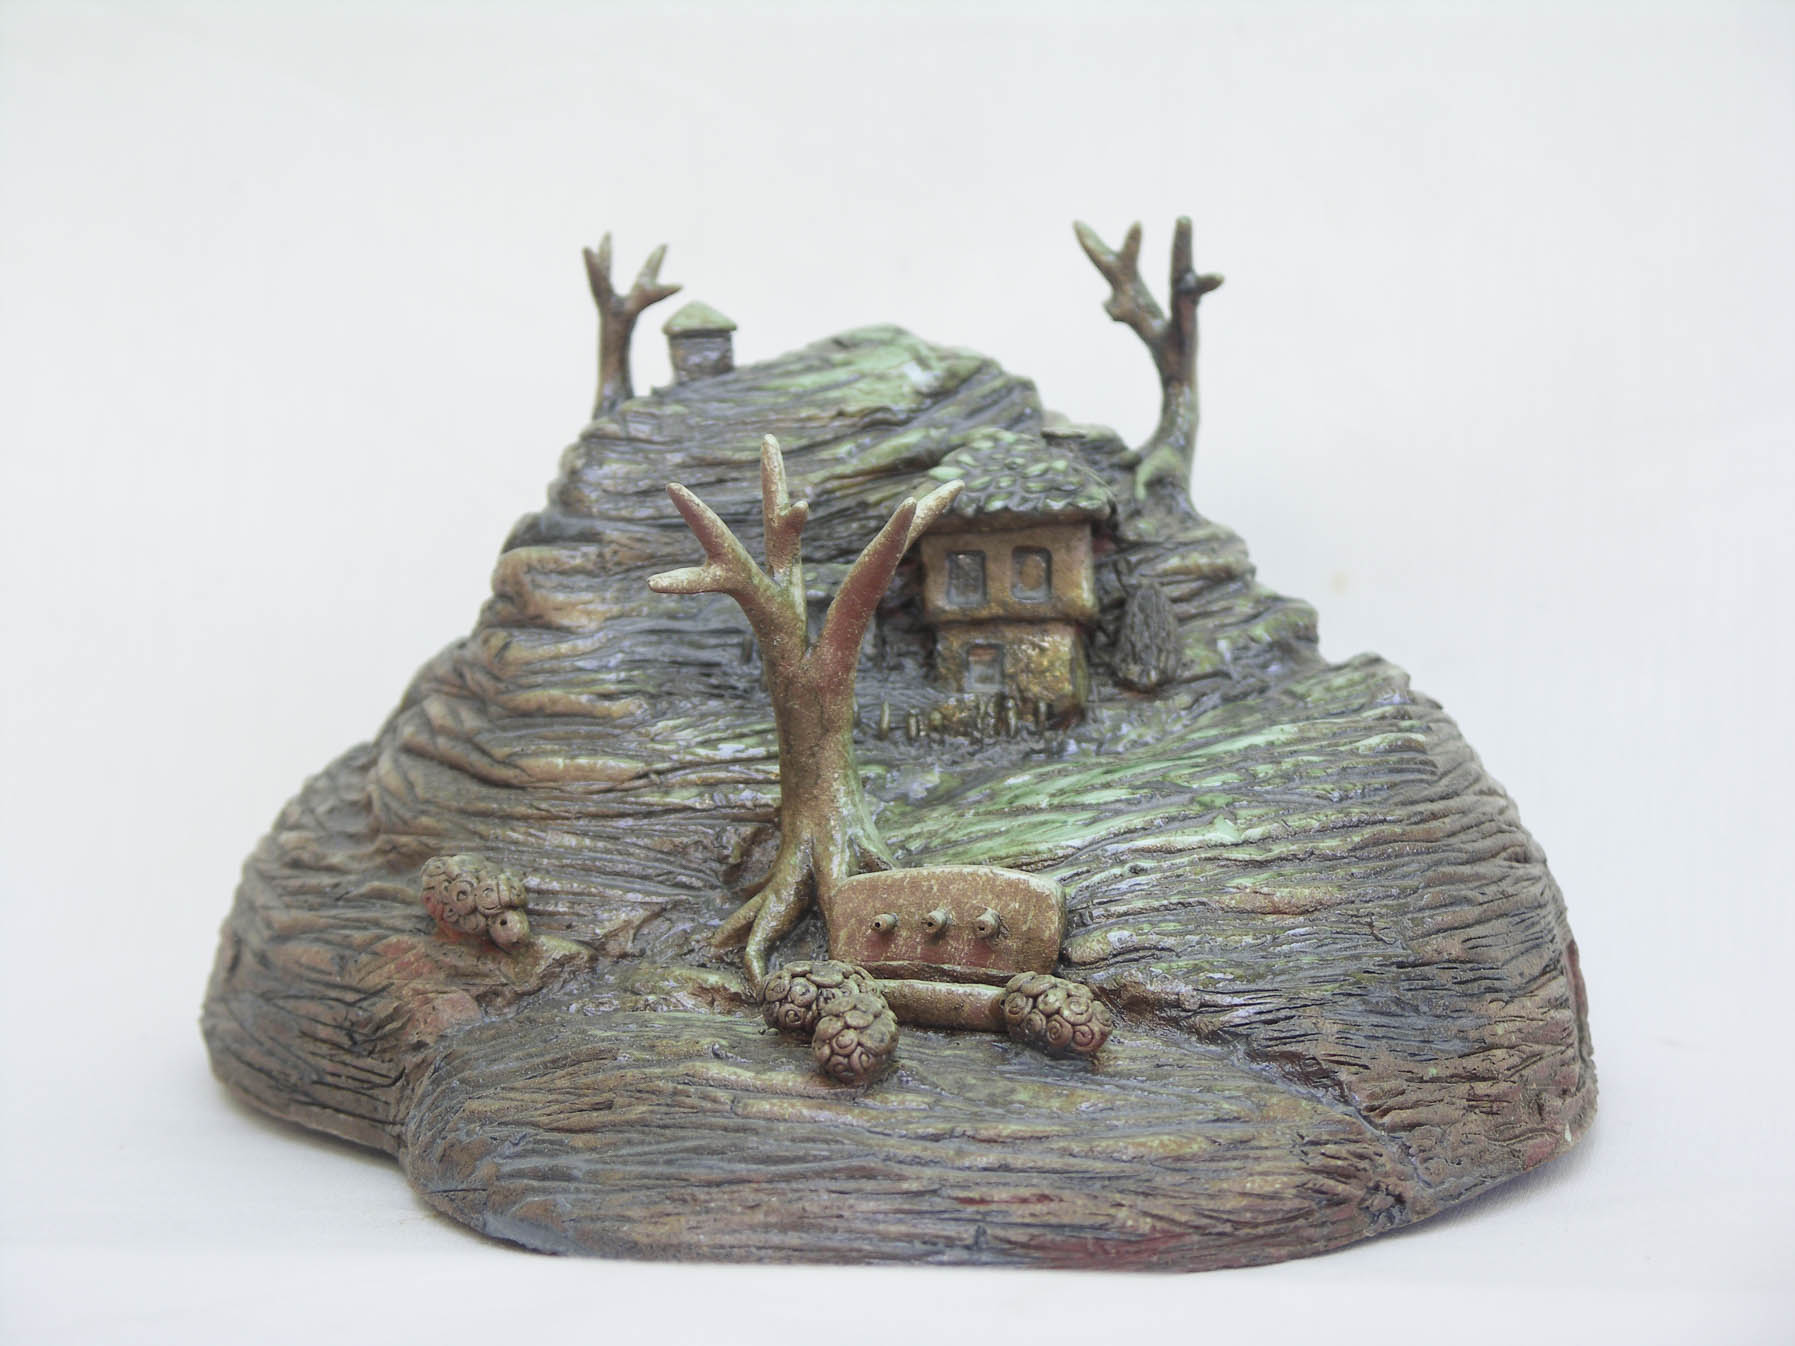 troyan-museum-ralica-yovkova-9